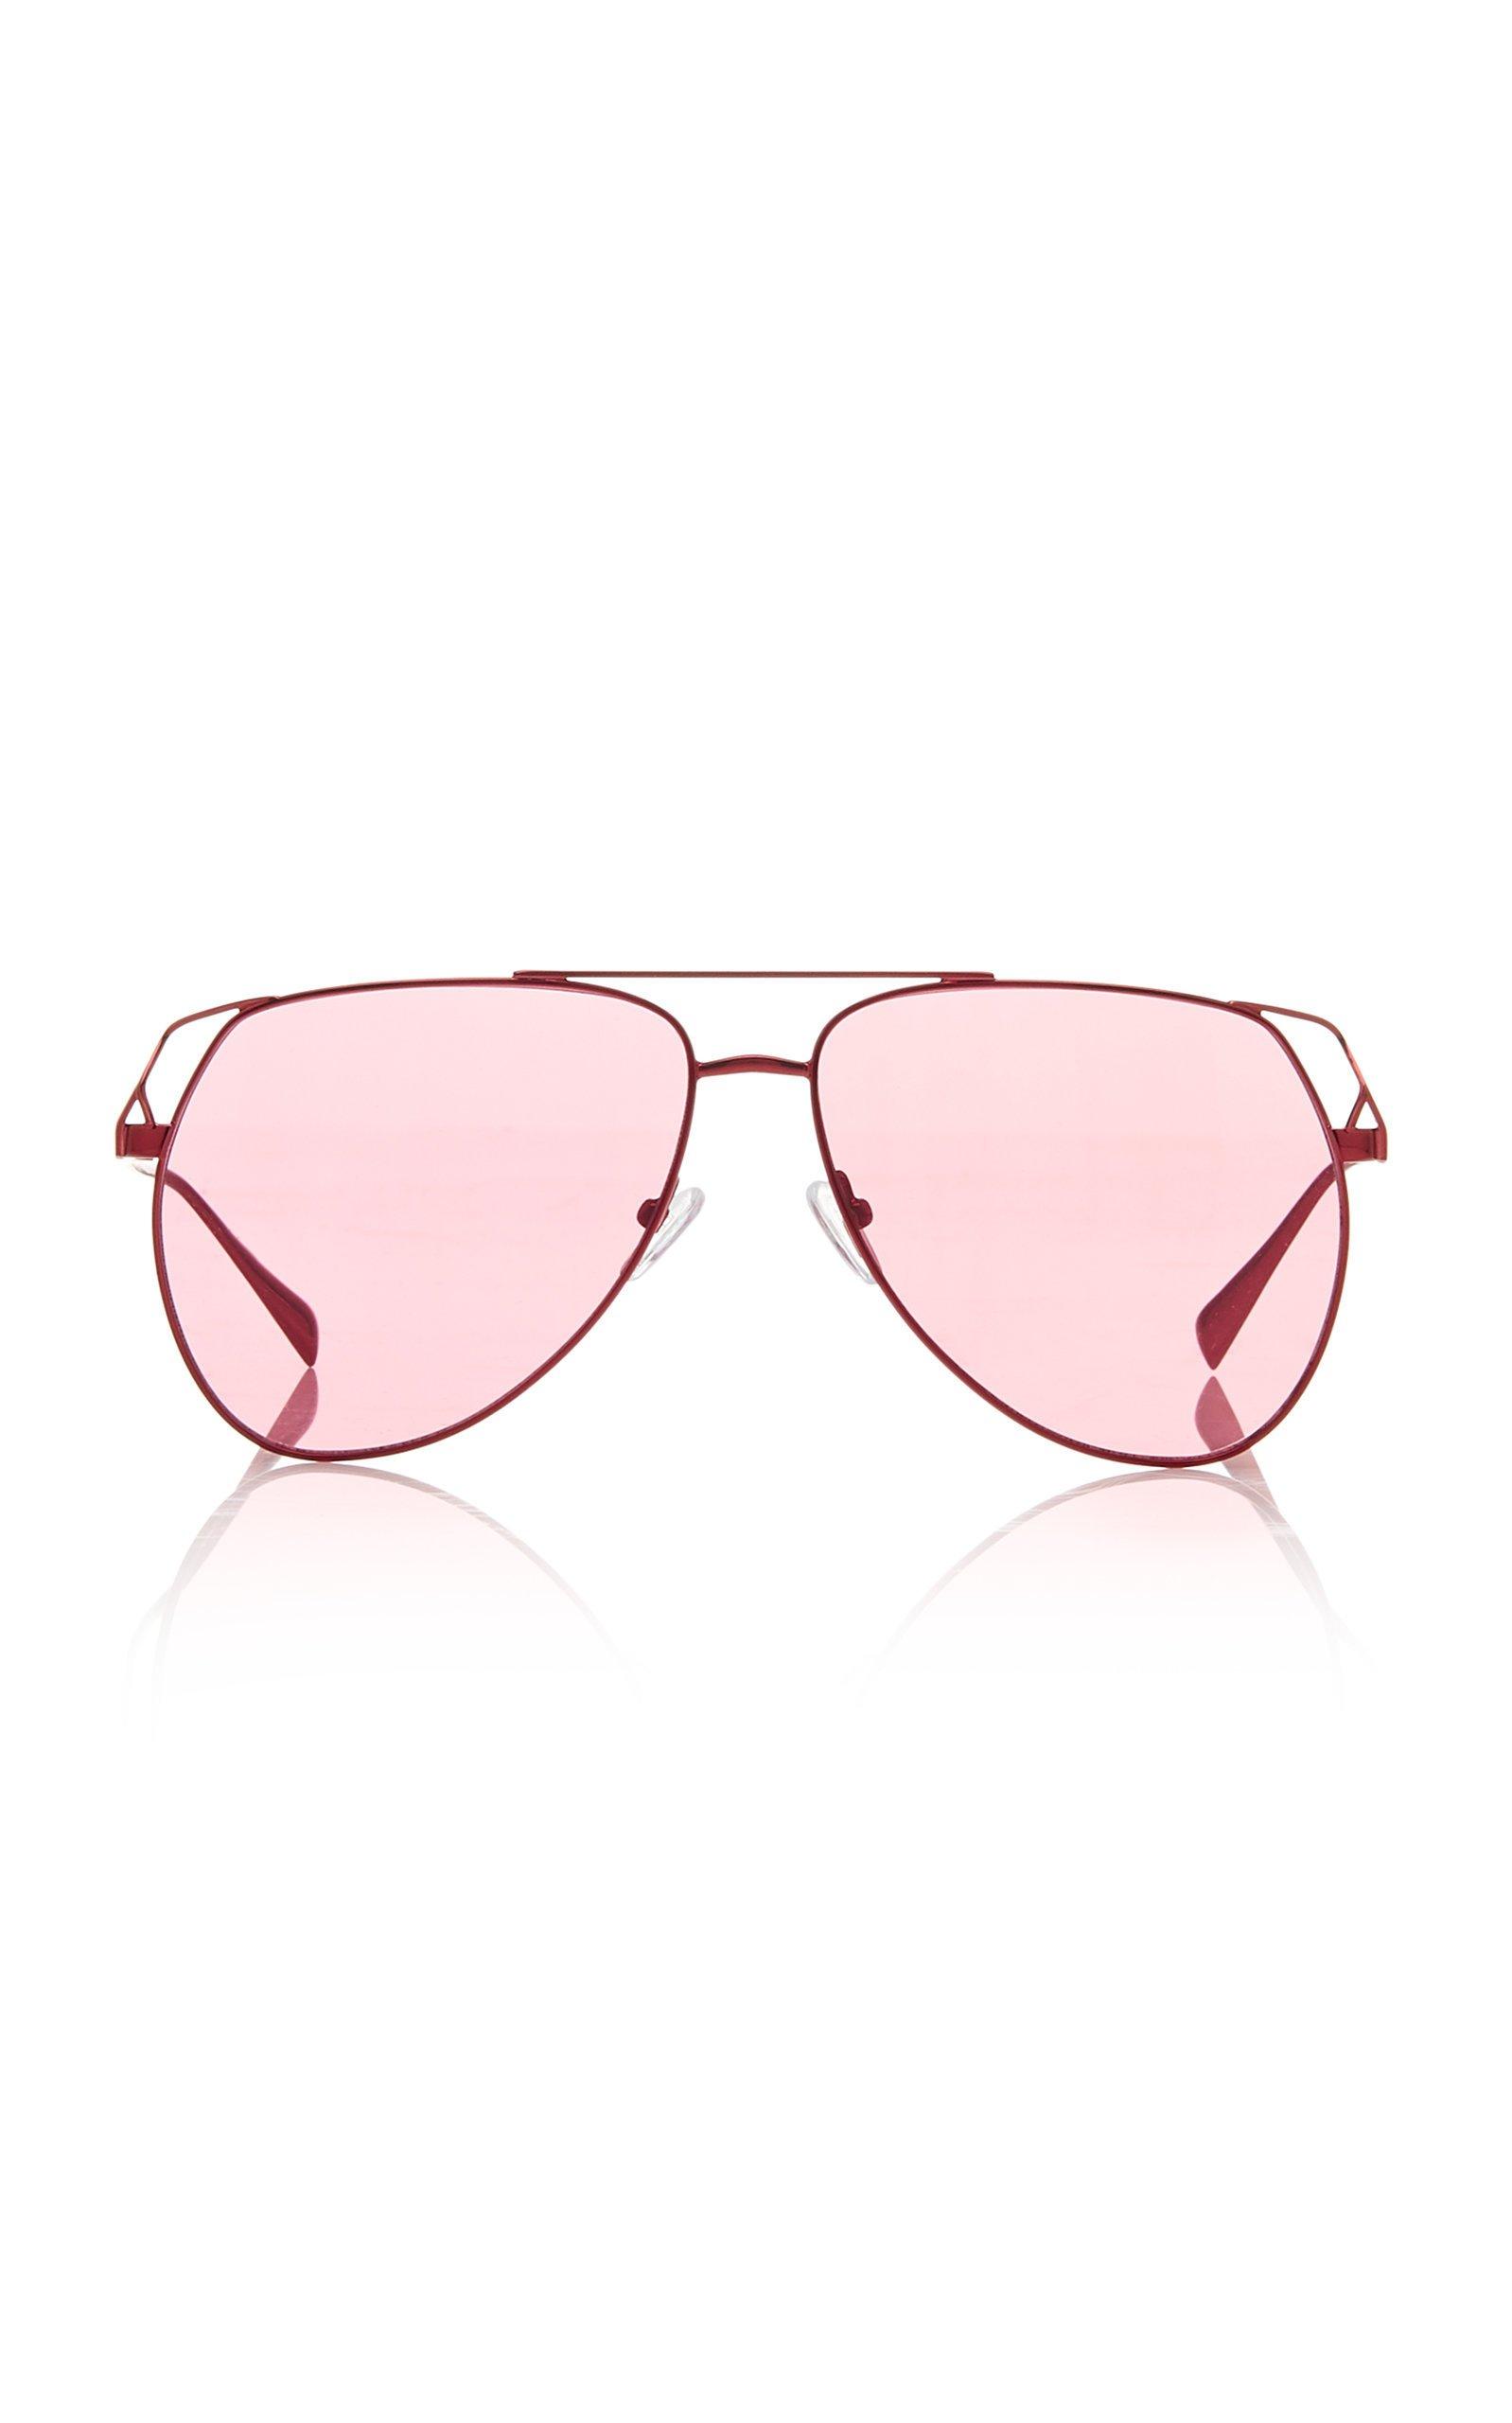 Attico x Linda Farrow Telma Metal Aviator Sunglasses